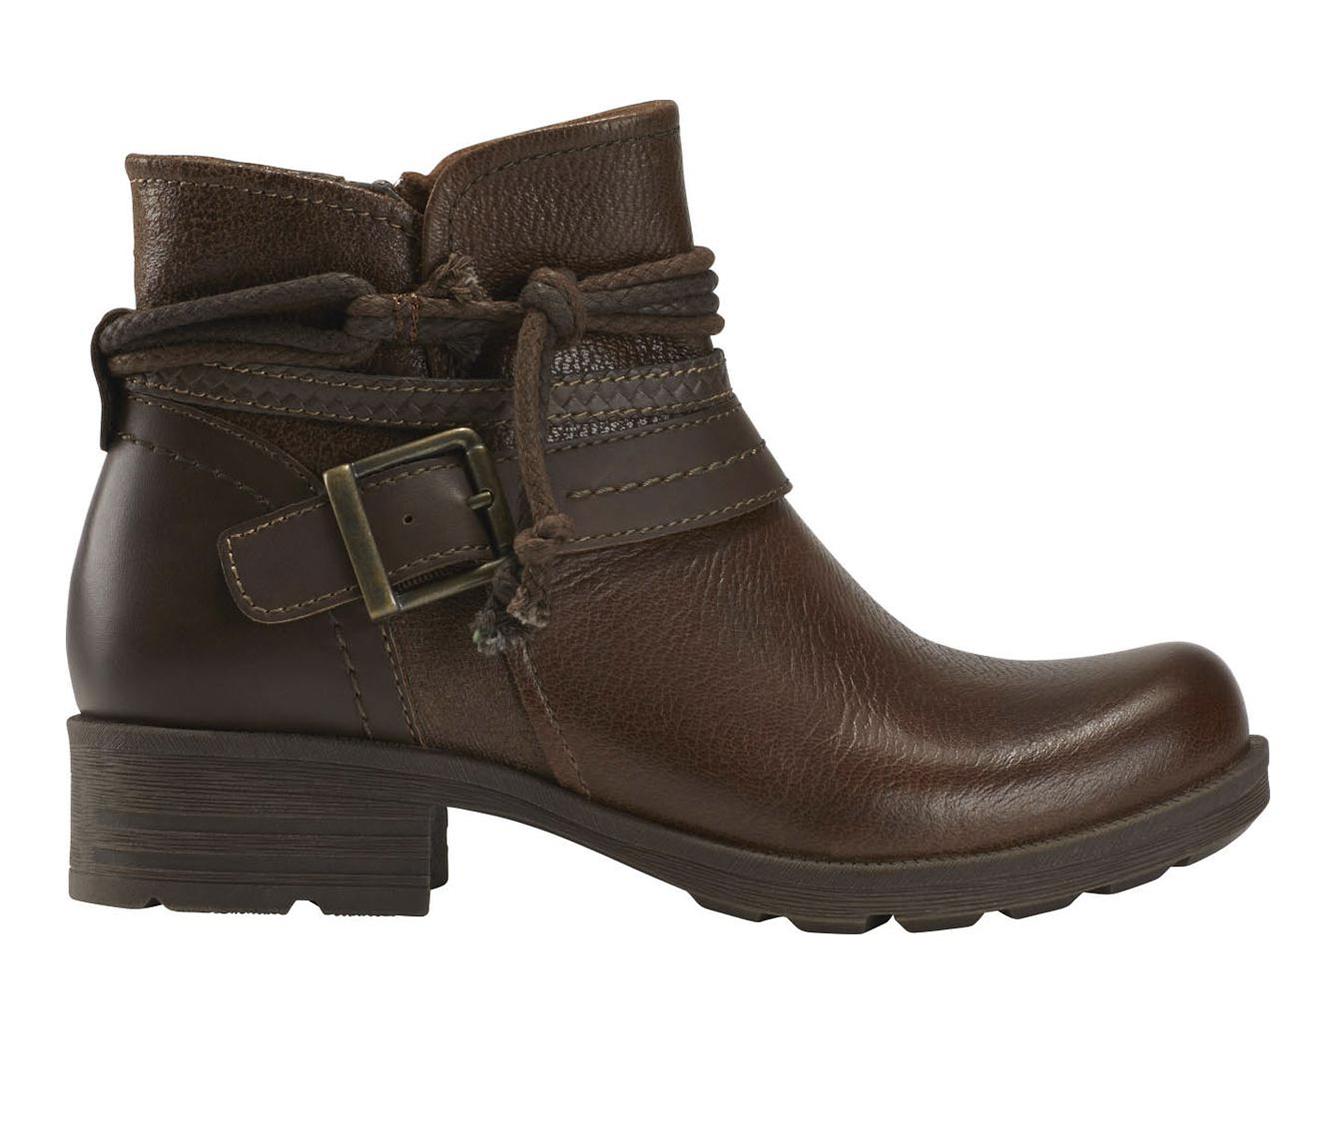 Earth Origins Randi Radley Women's Boots (Brown - Leather)